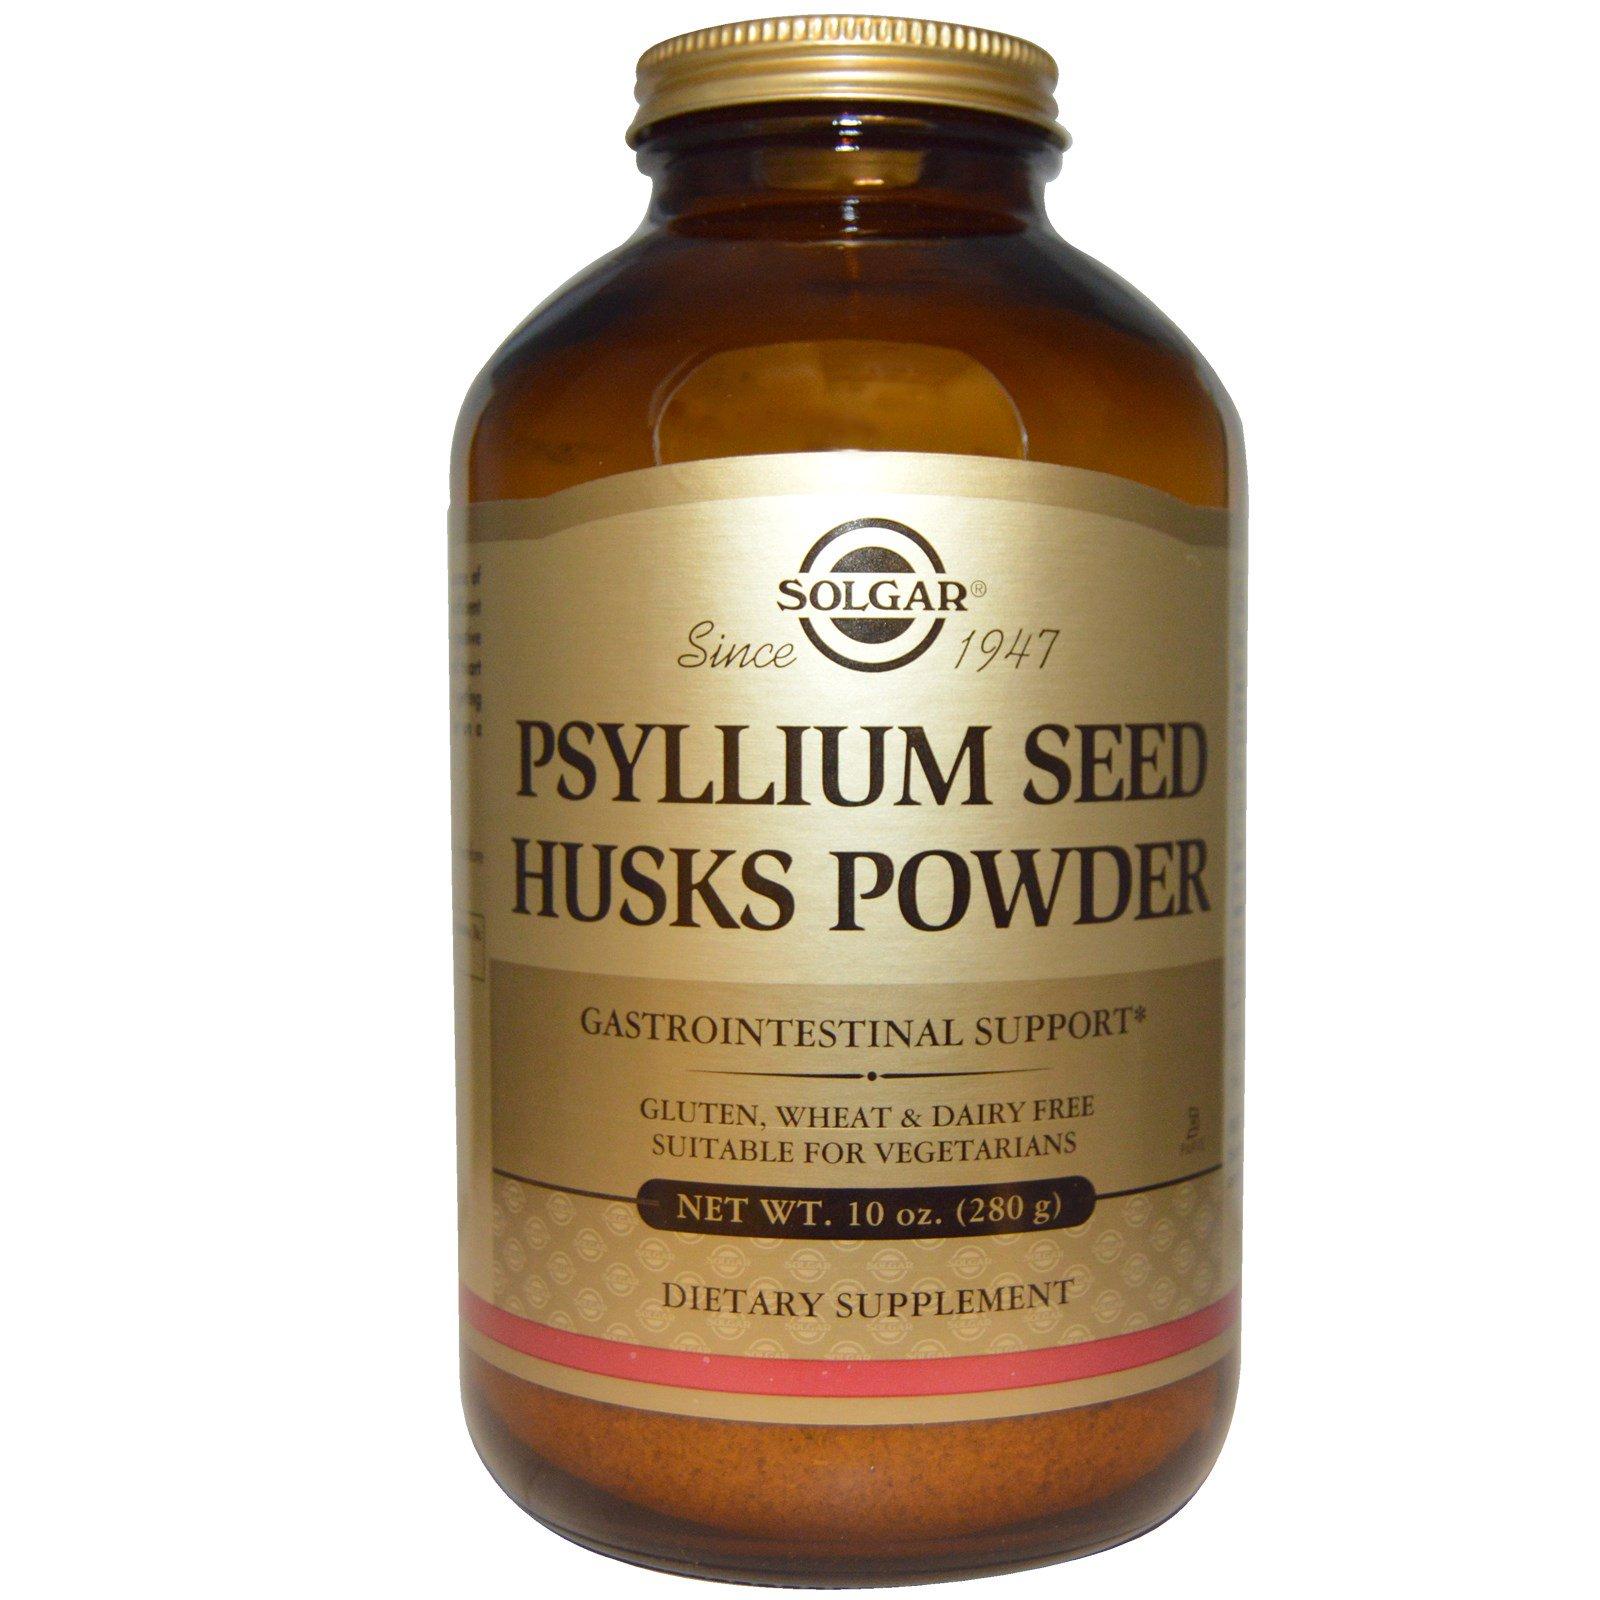 Solgar Psyllium Seed Husks Powder 10 Oz 280 G Iherbcom